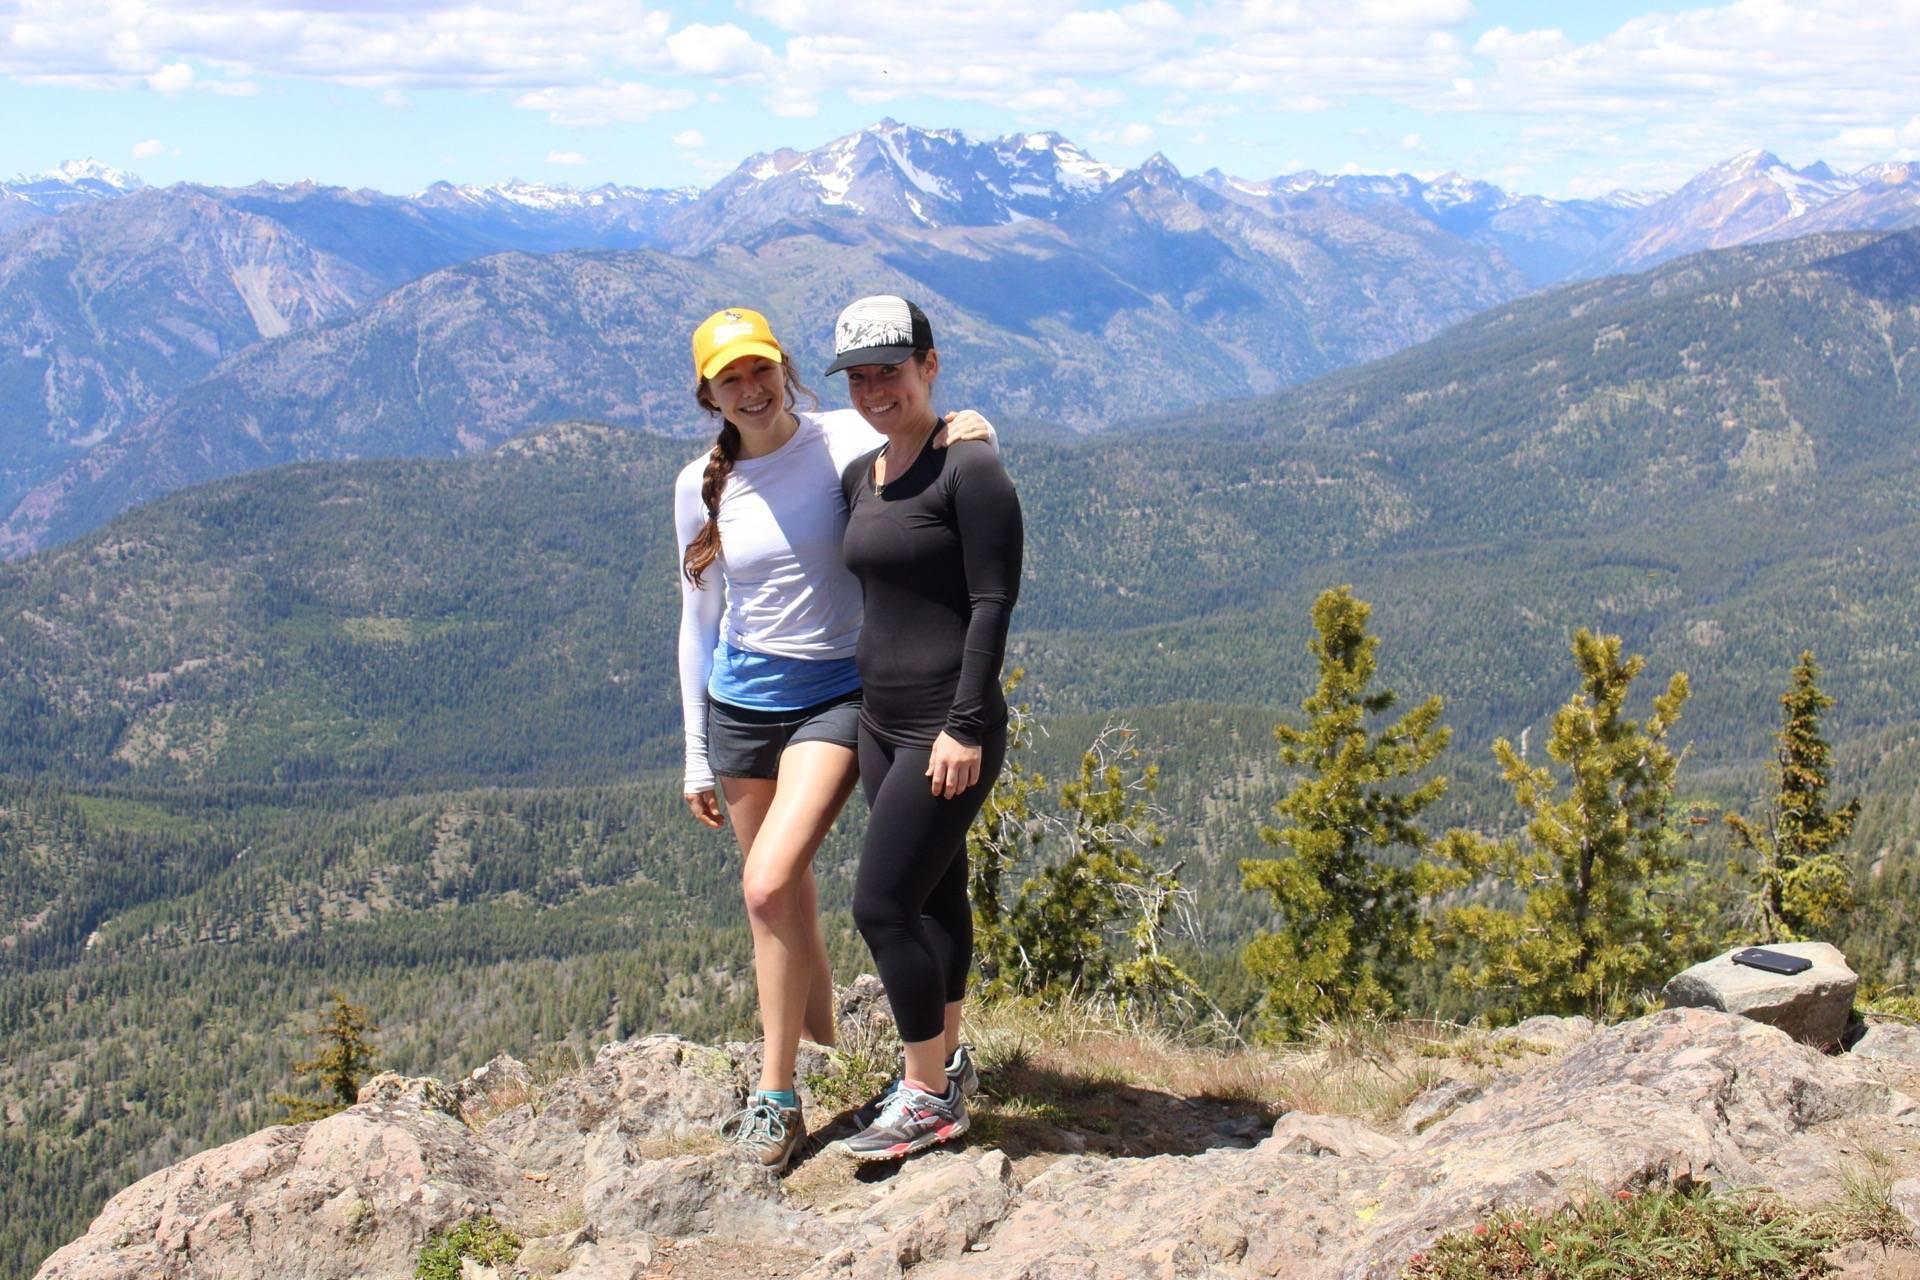 Top of Goat Peak Lookout in Mazama, WA